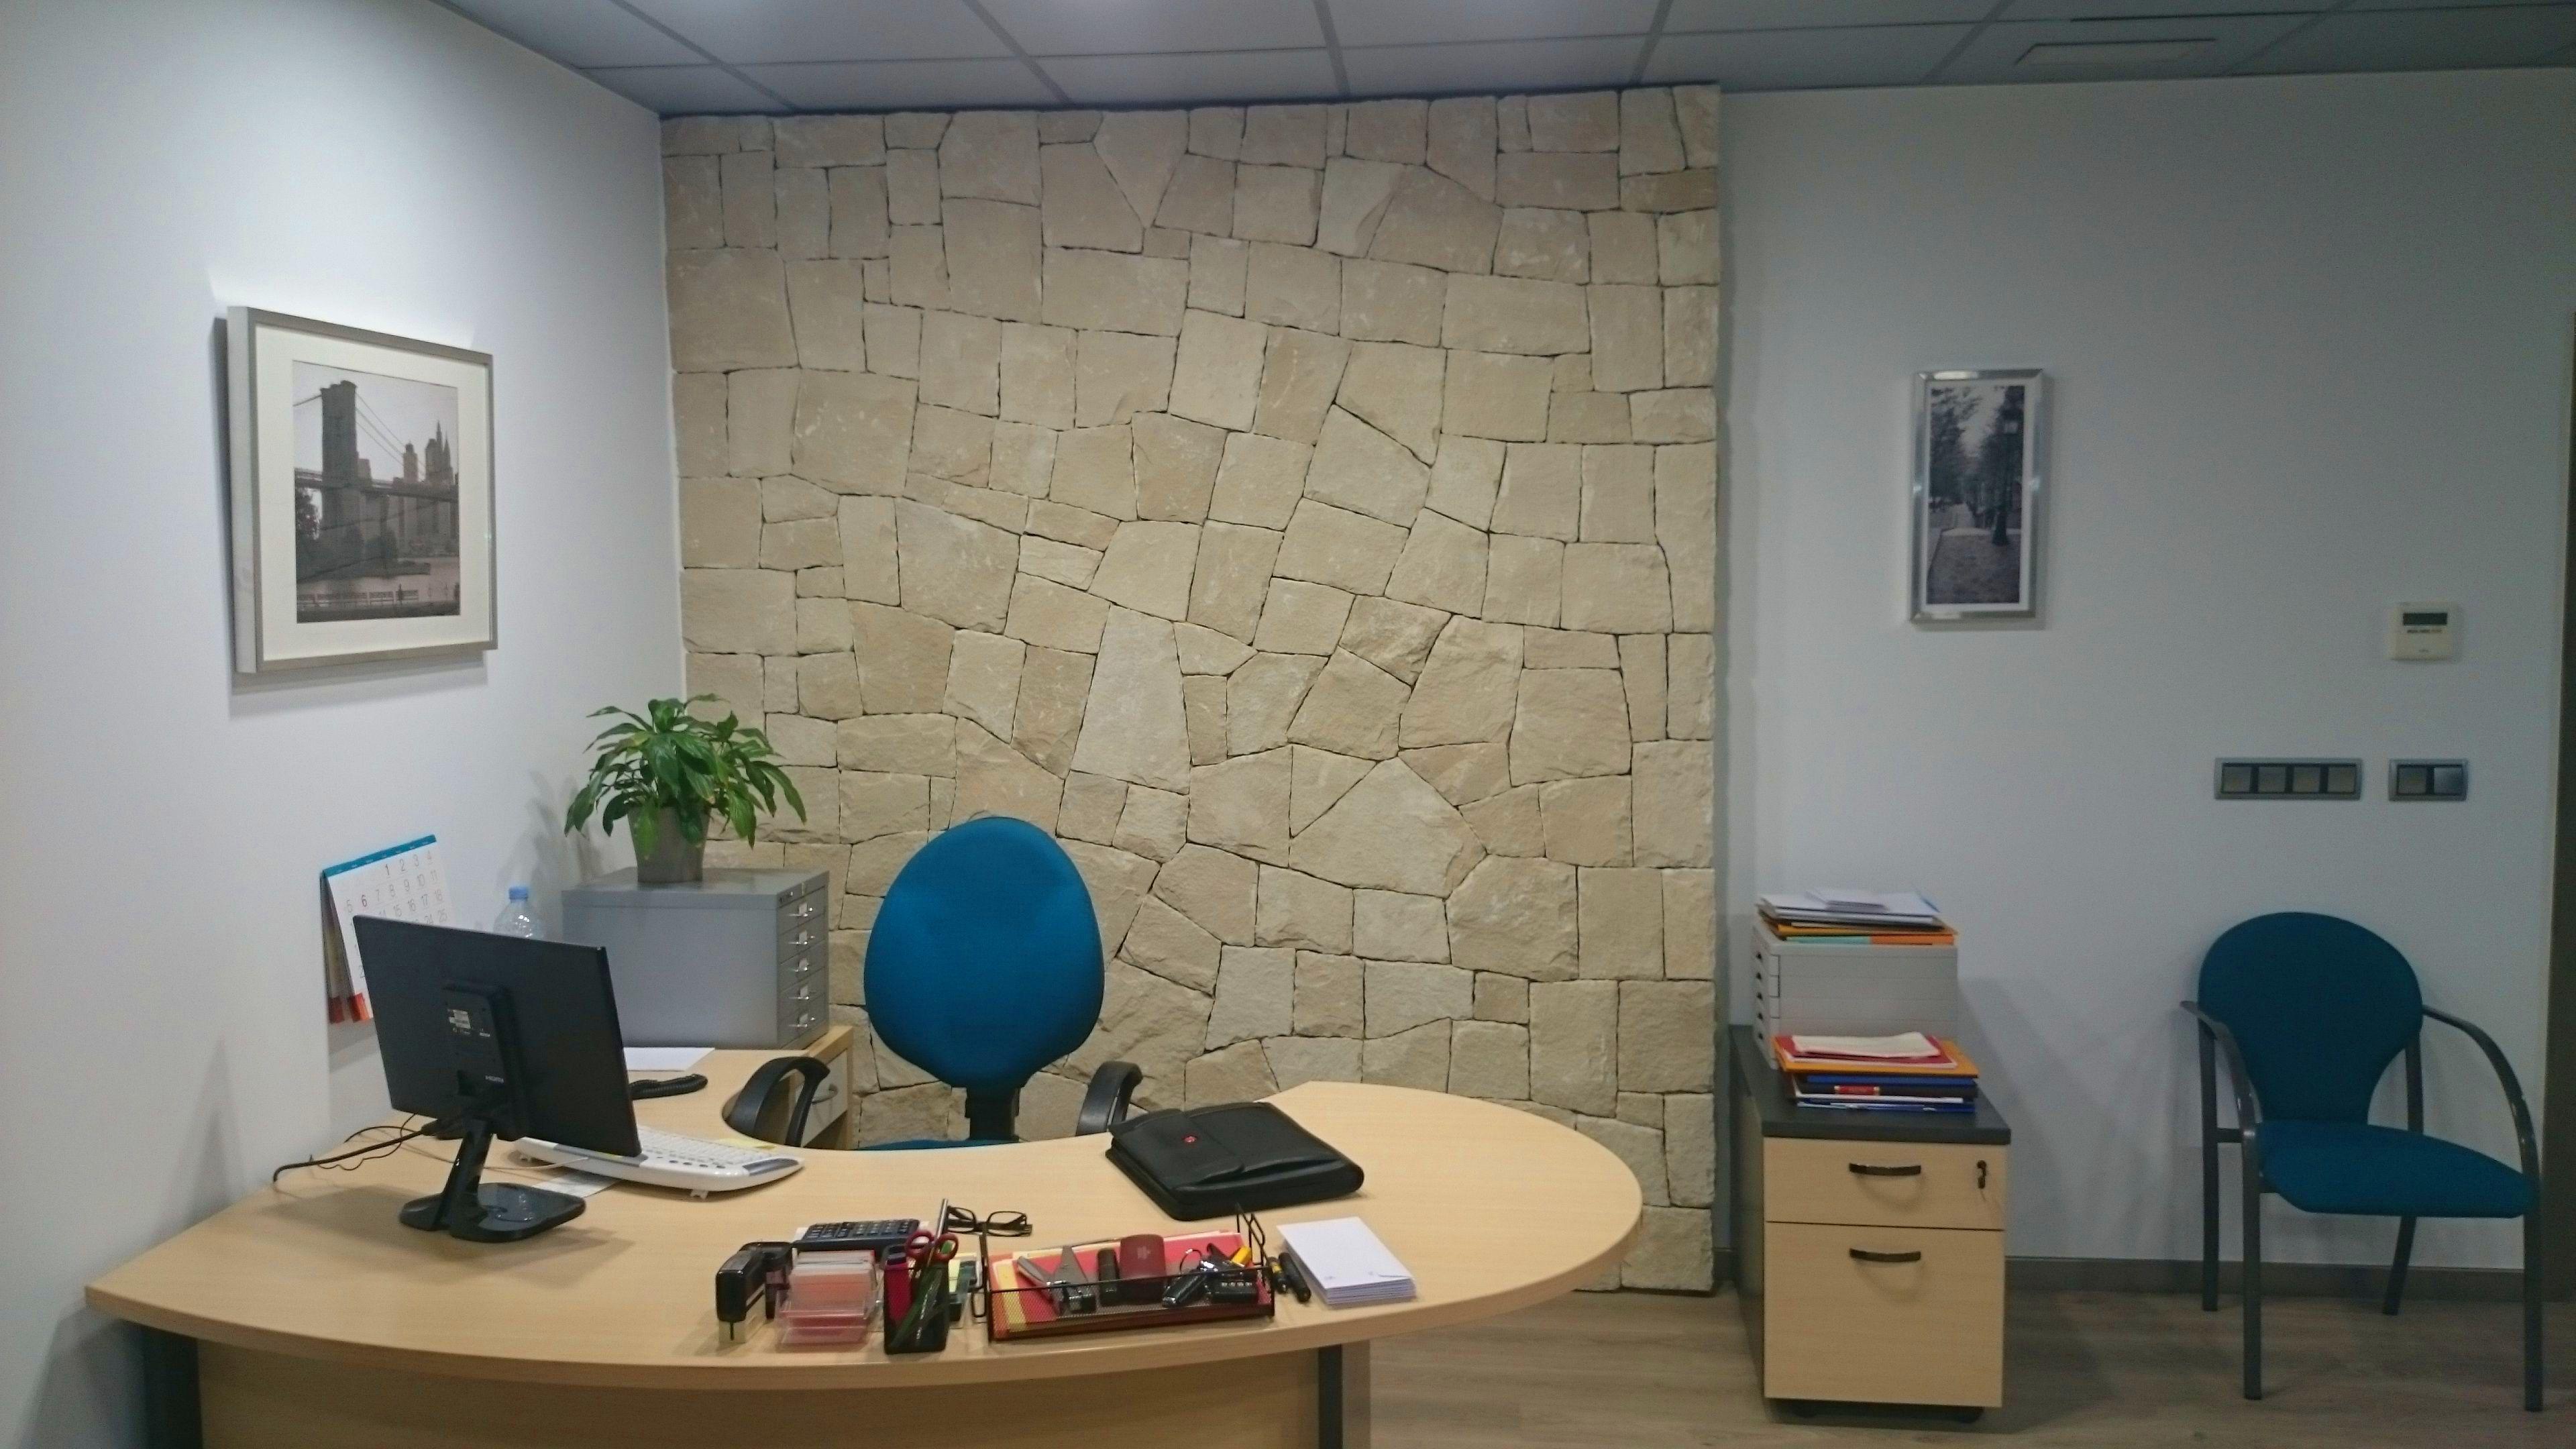 Decoración de interior (oficina) en mampostería concertada en seco (hueso)